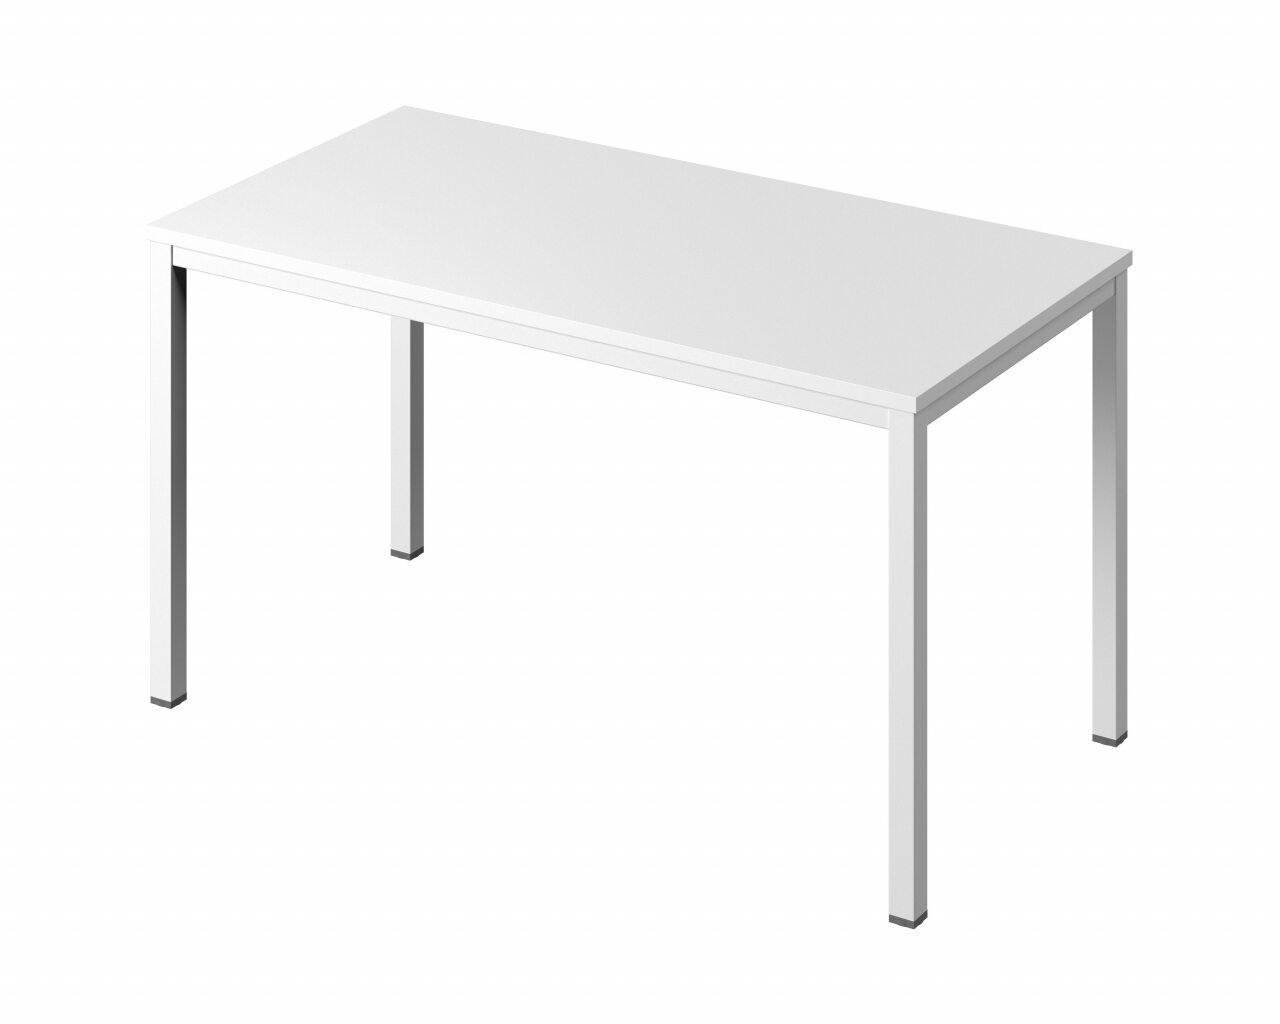 Стол на металлокаркасе без заглушек кабель-канала  Public Comfort 135x70x74 - фото 6